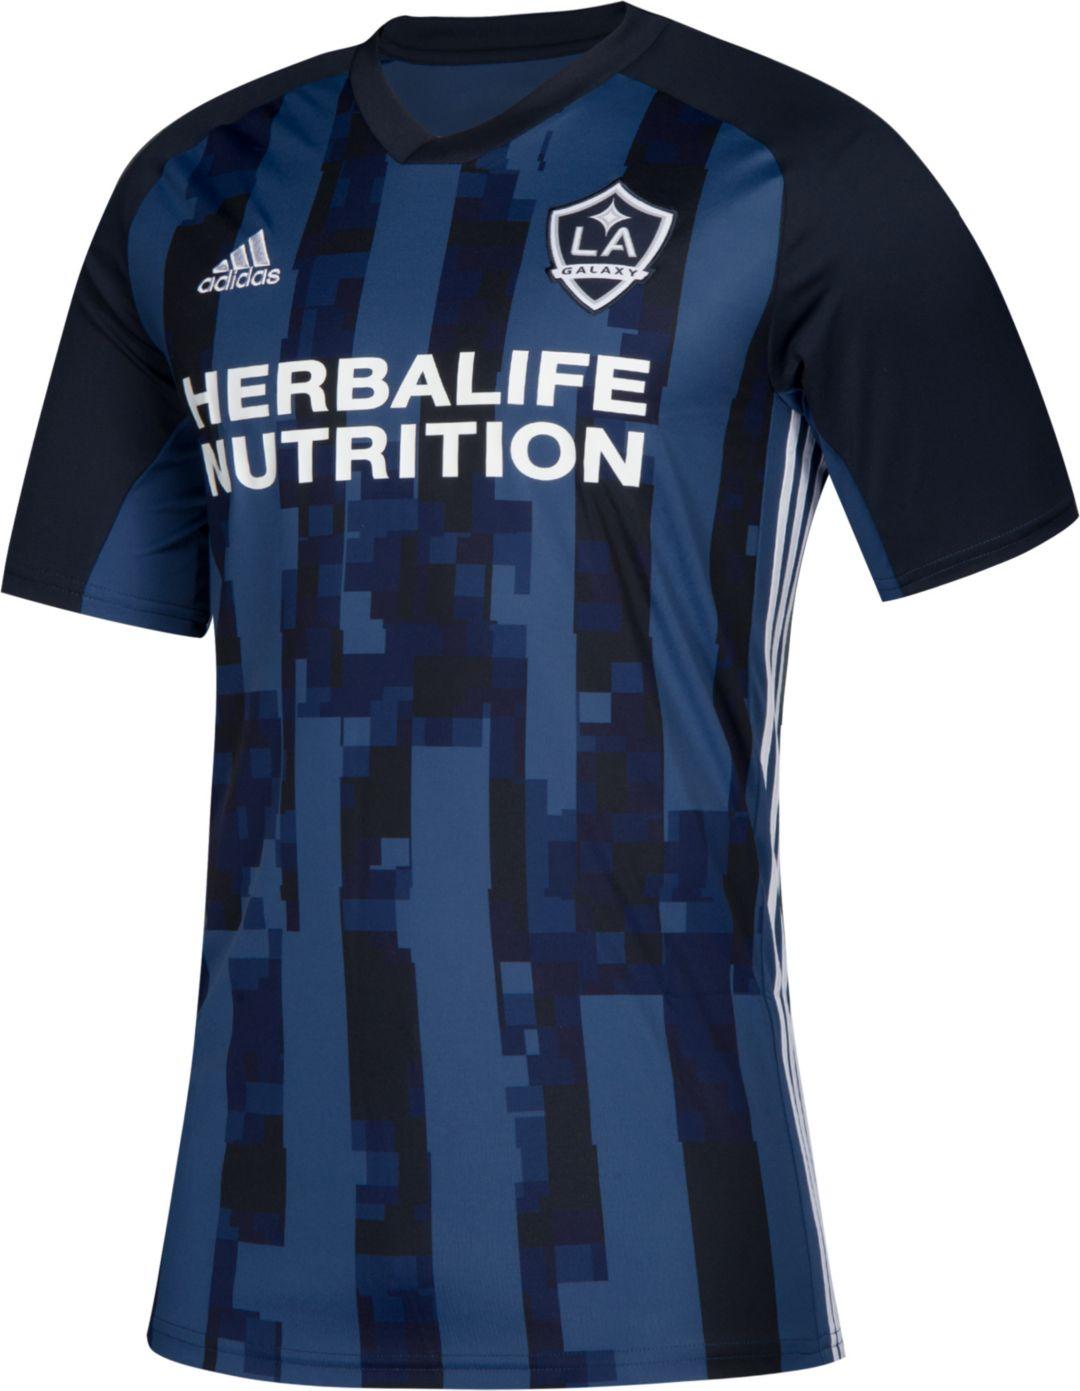 on sale f8c12 06969 adidas Men's Los Angeles Galaxy Zlatan Ibrahimovic #9 Secondary Replica  Jersey